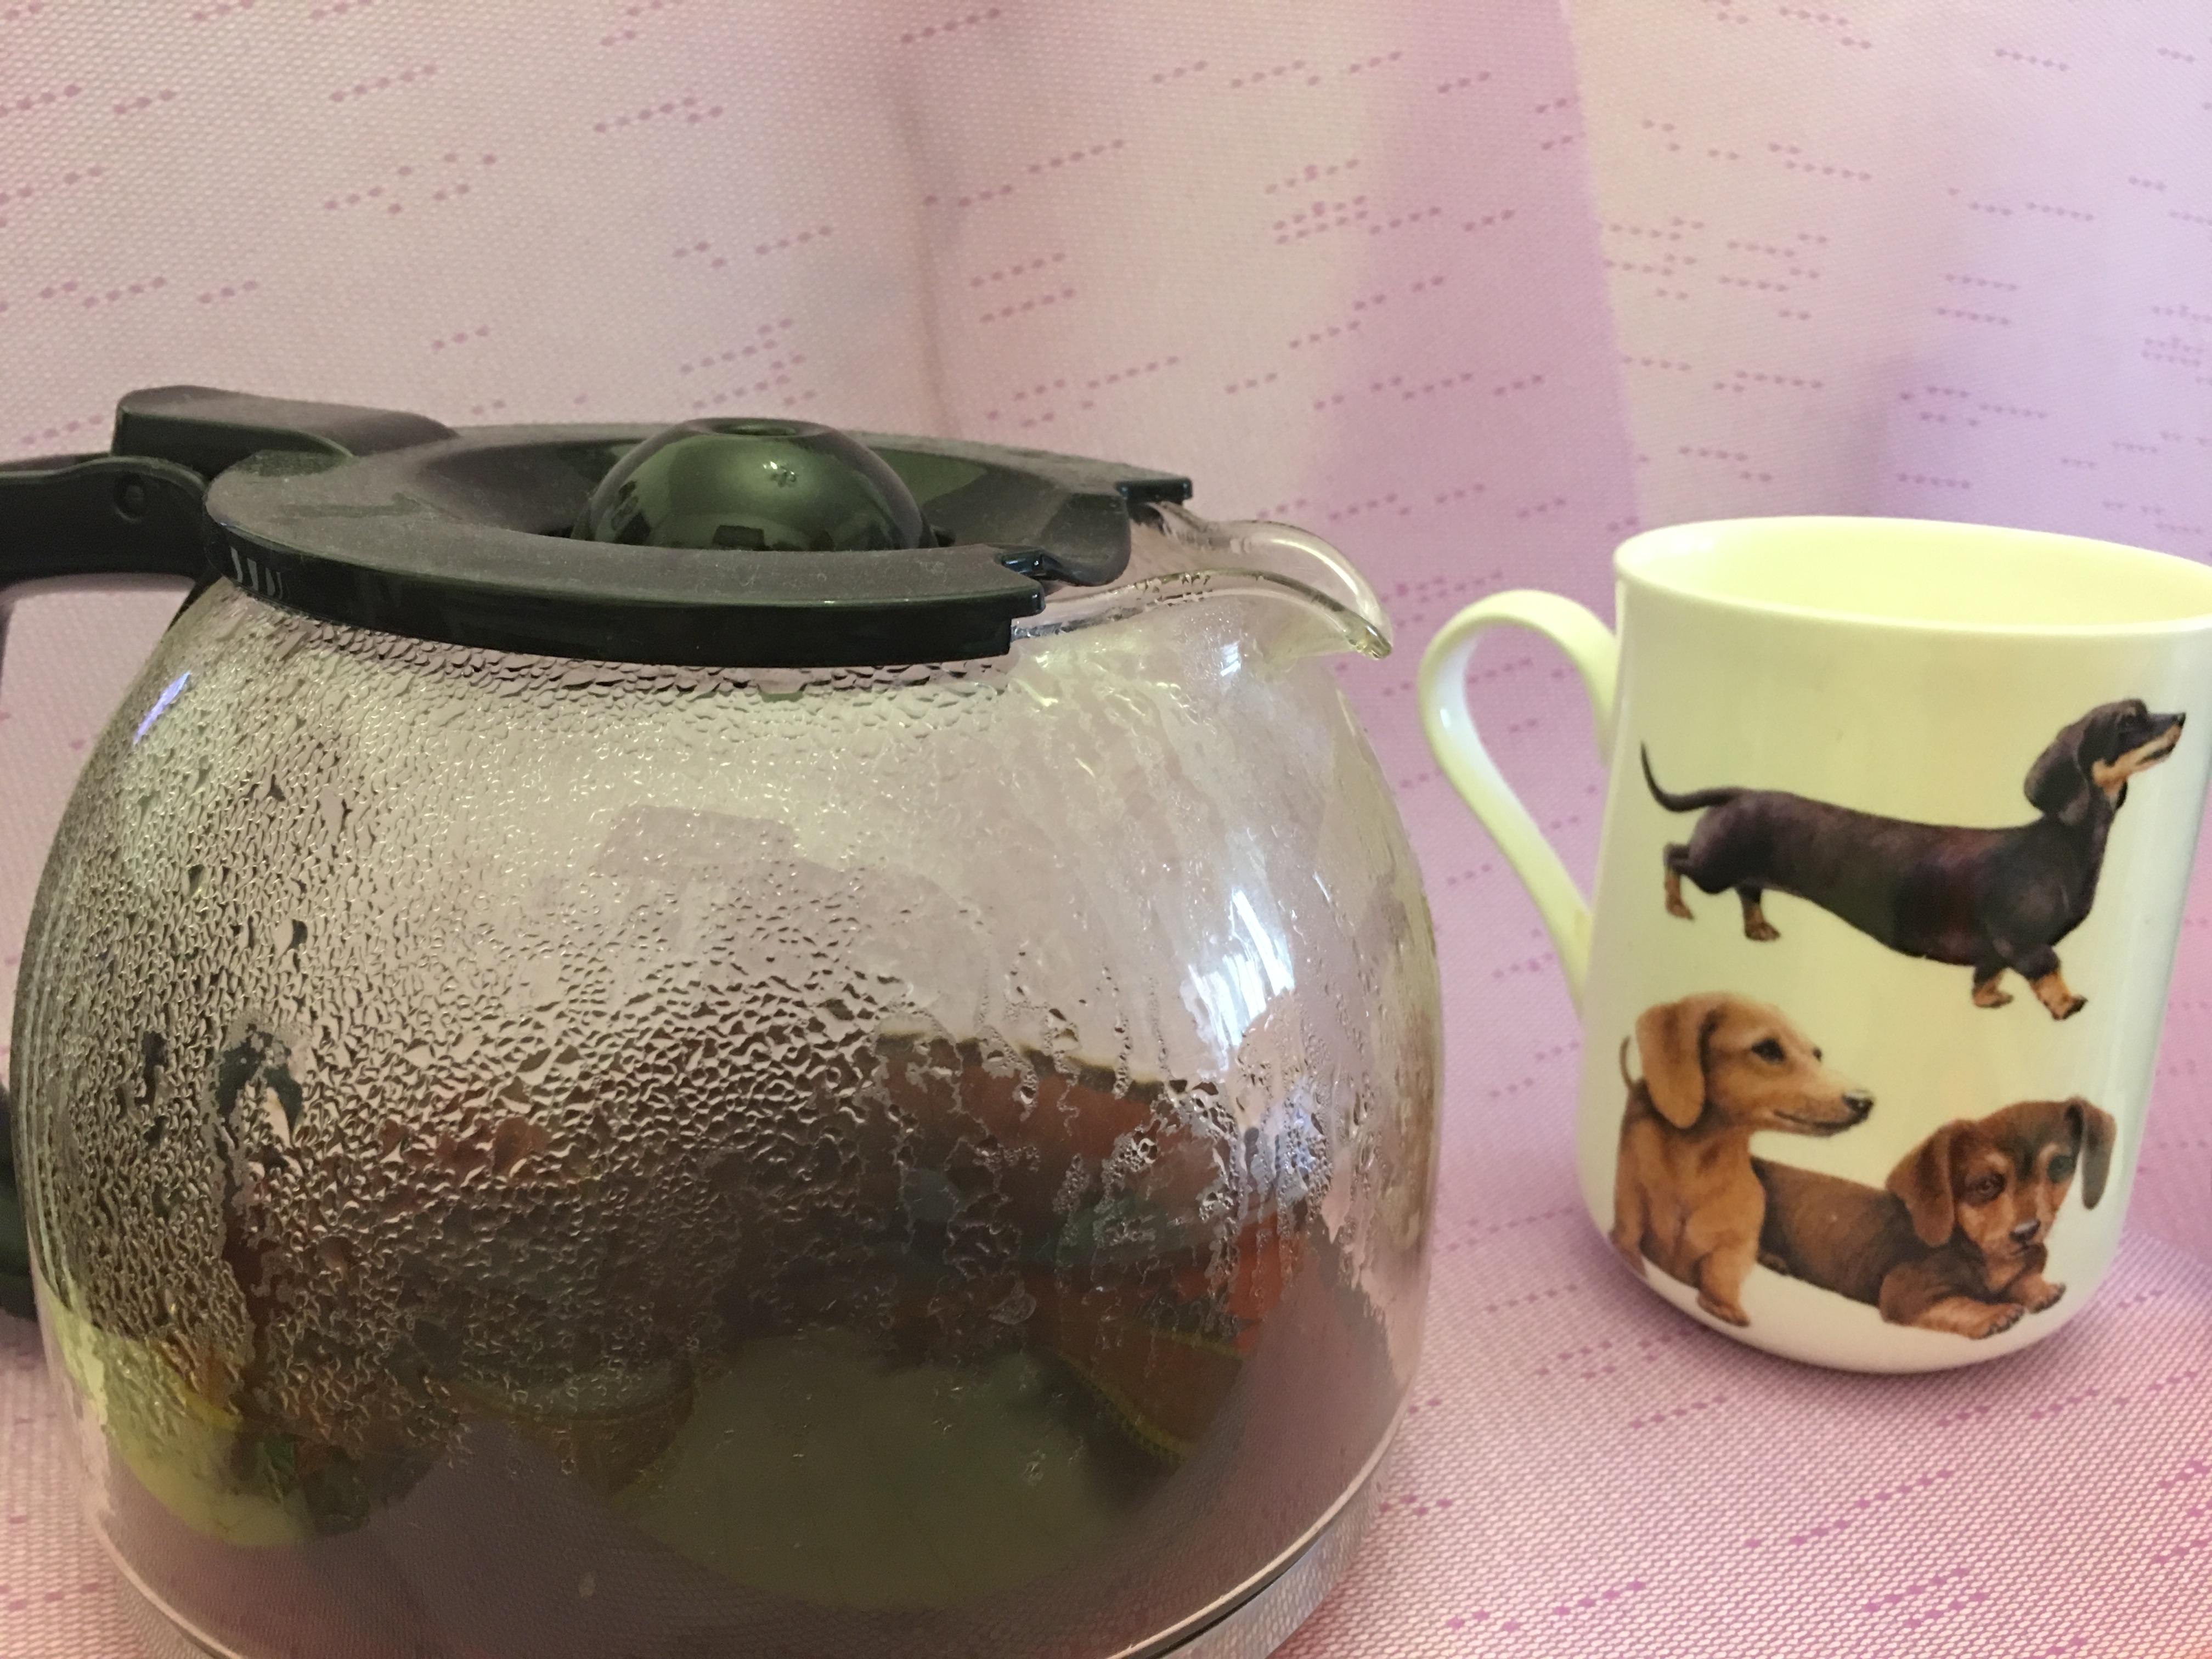 Lunedì. Caffè con un shottino di cinismo - www.matteotuveri.it